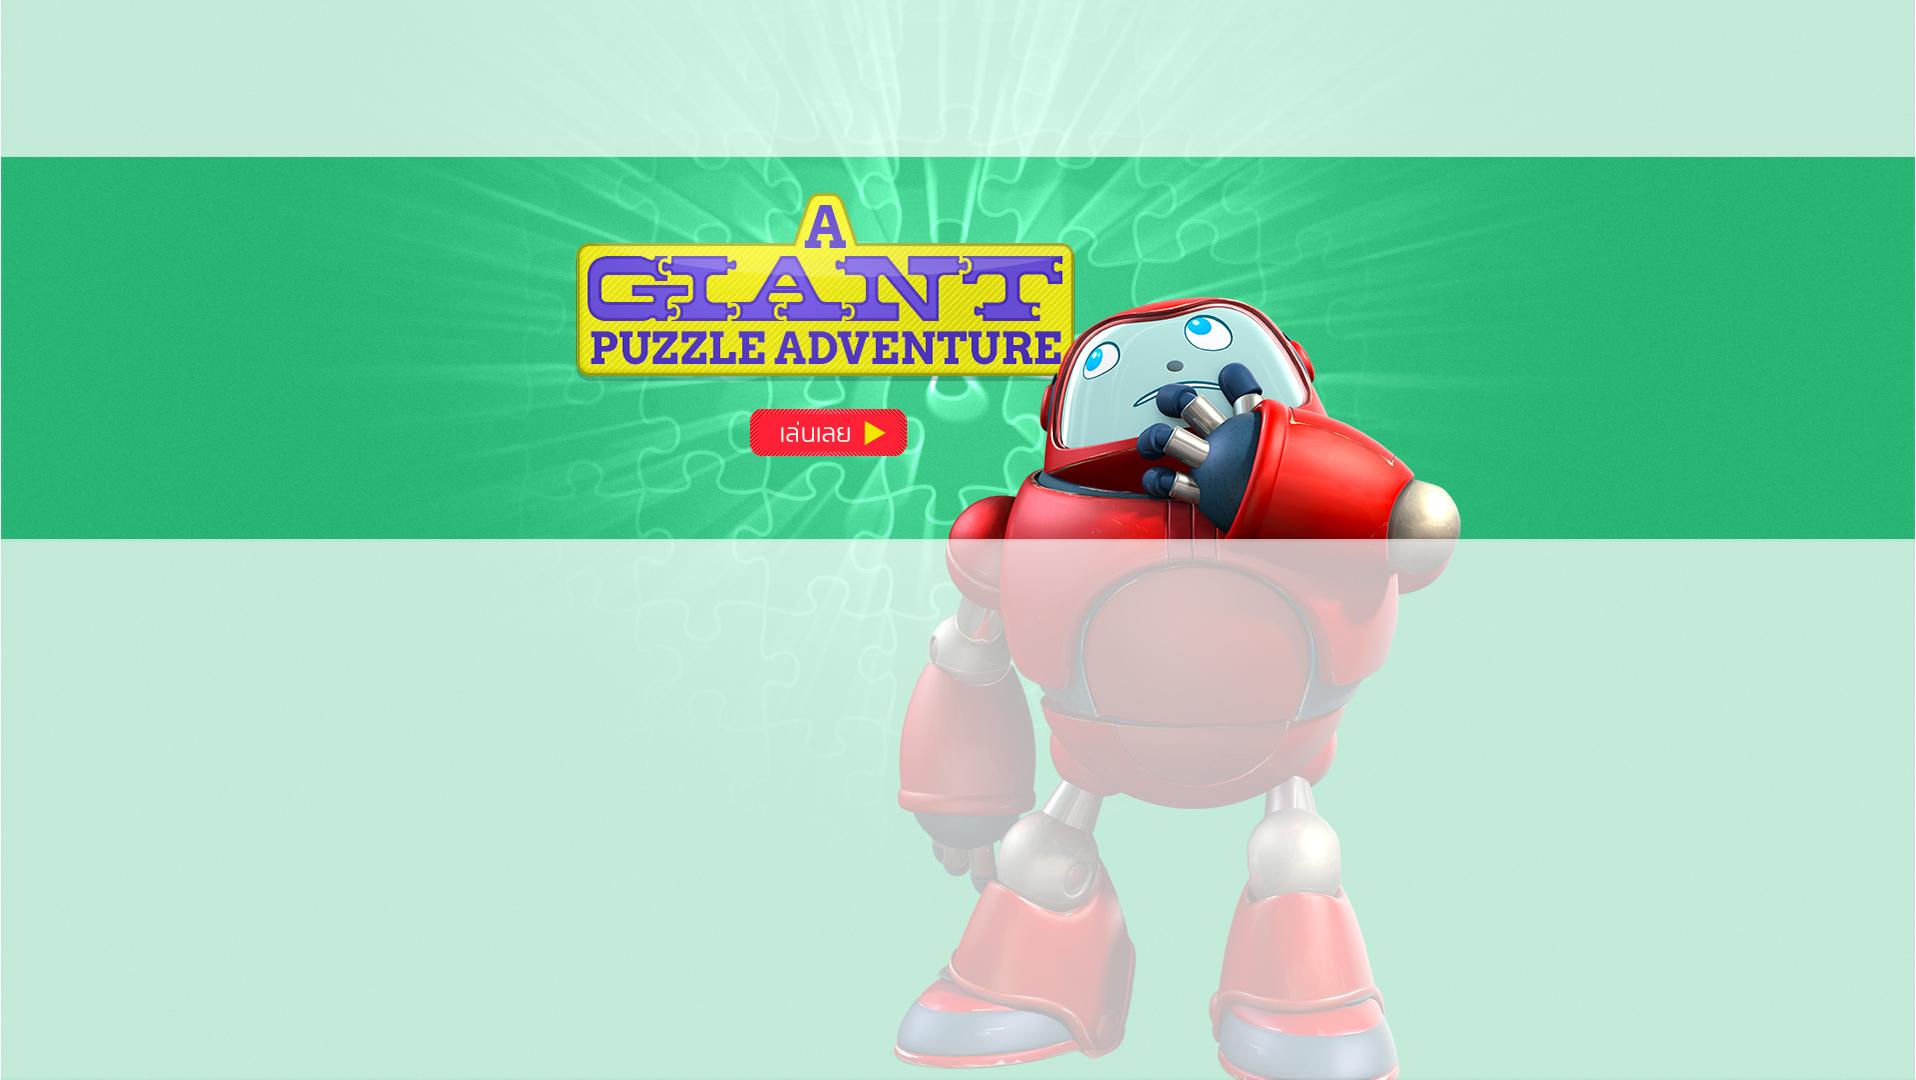 <h2>A Giant Puzzle Adventure</h2>